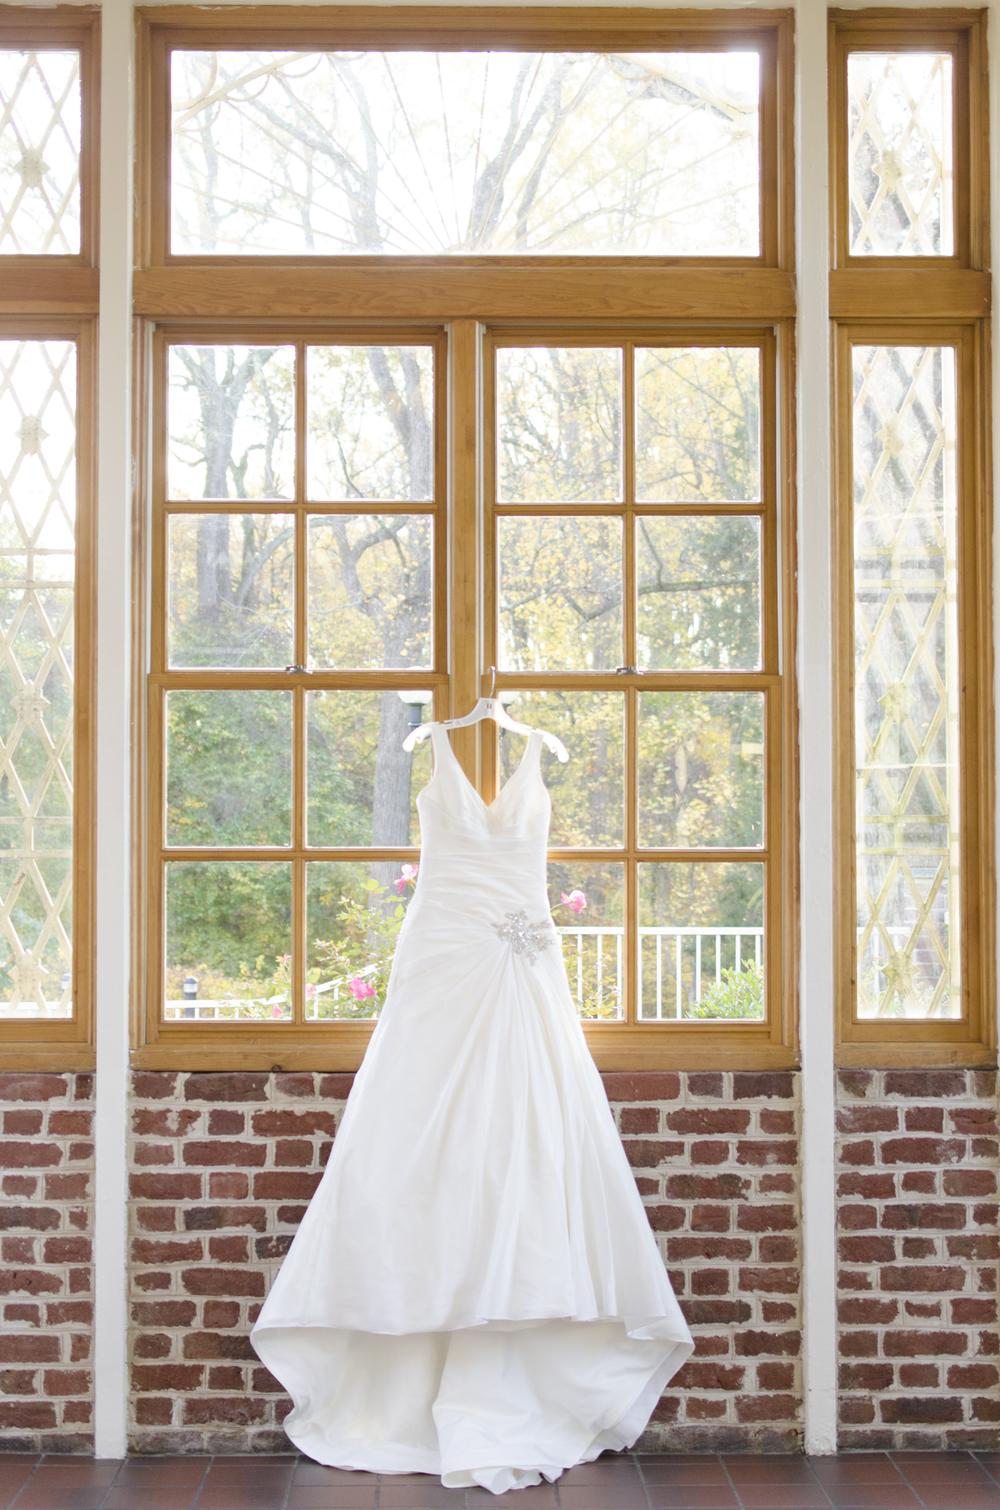 Ellis Bridals wedding dress